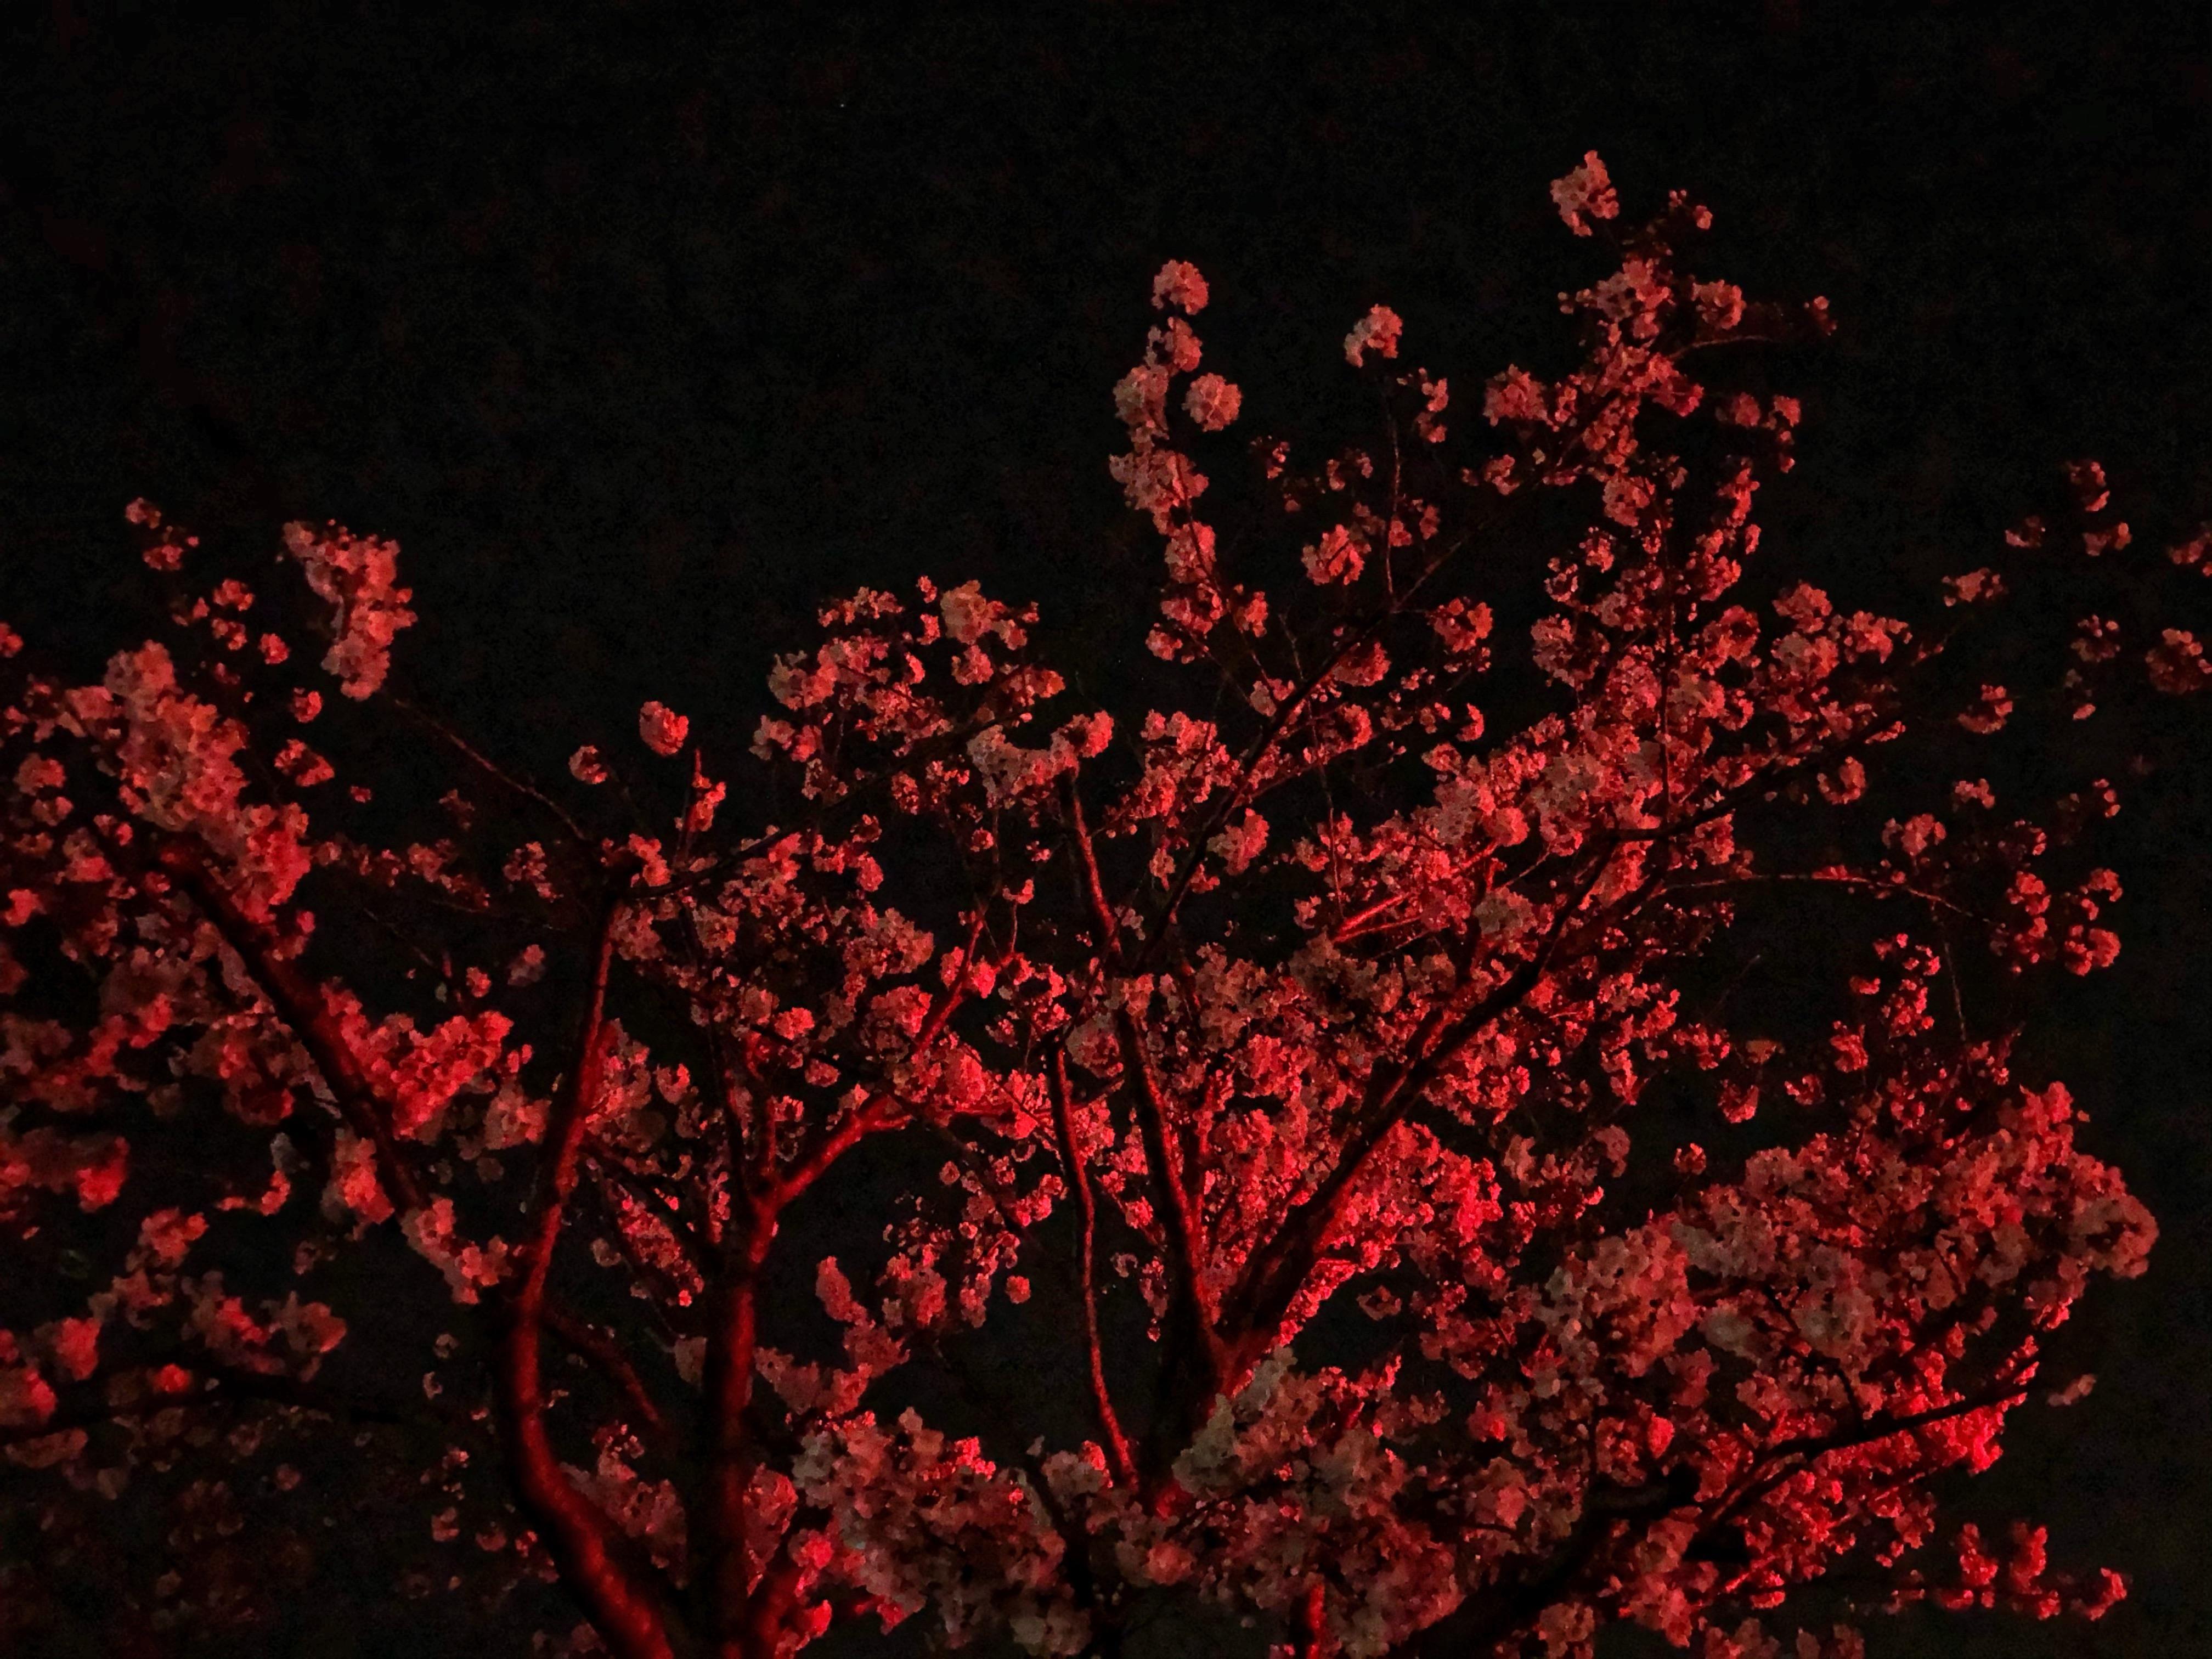 A Red Traffic Light Was Lighting Up This Cherry Blossom Tree Oc Fukuoka Cherry Blossom Japan Red Cherry Blossom Cherry Blossom Tree